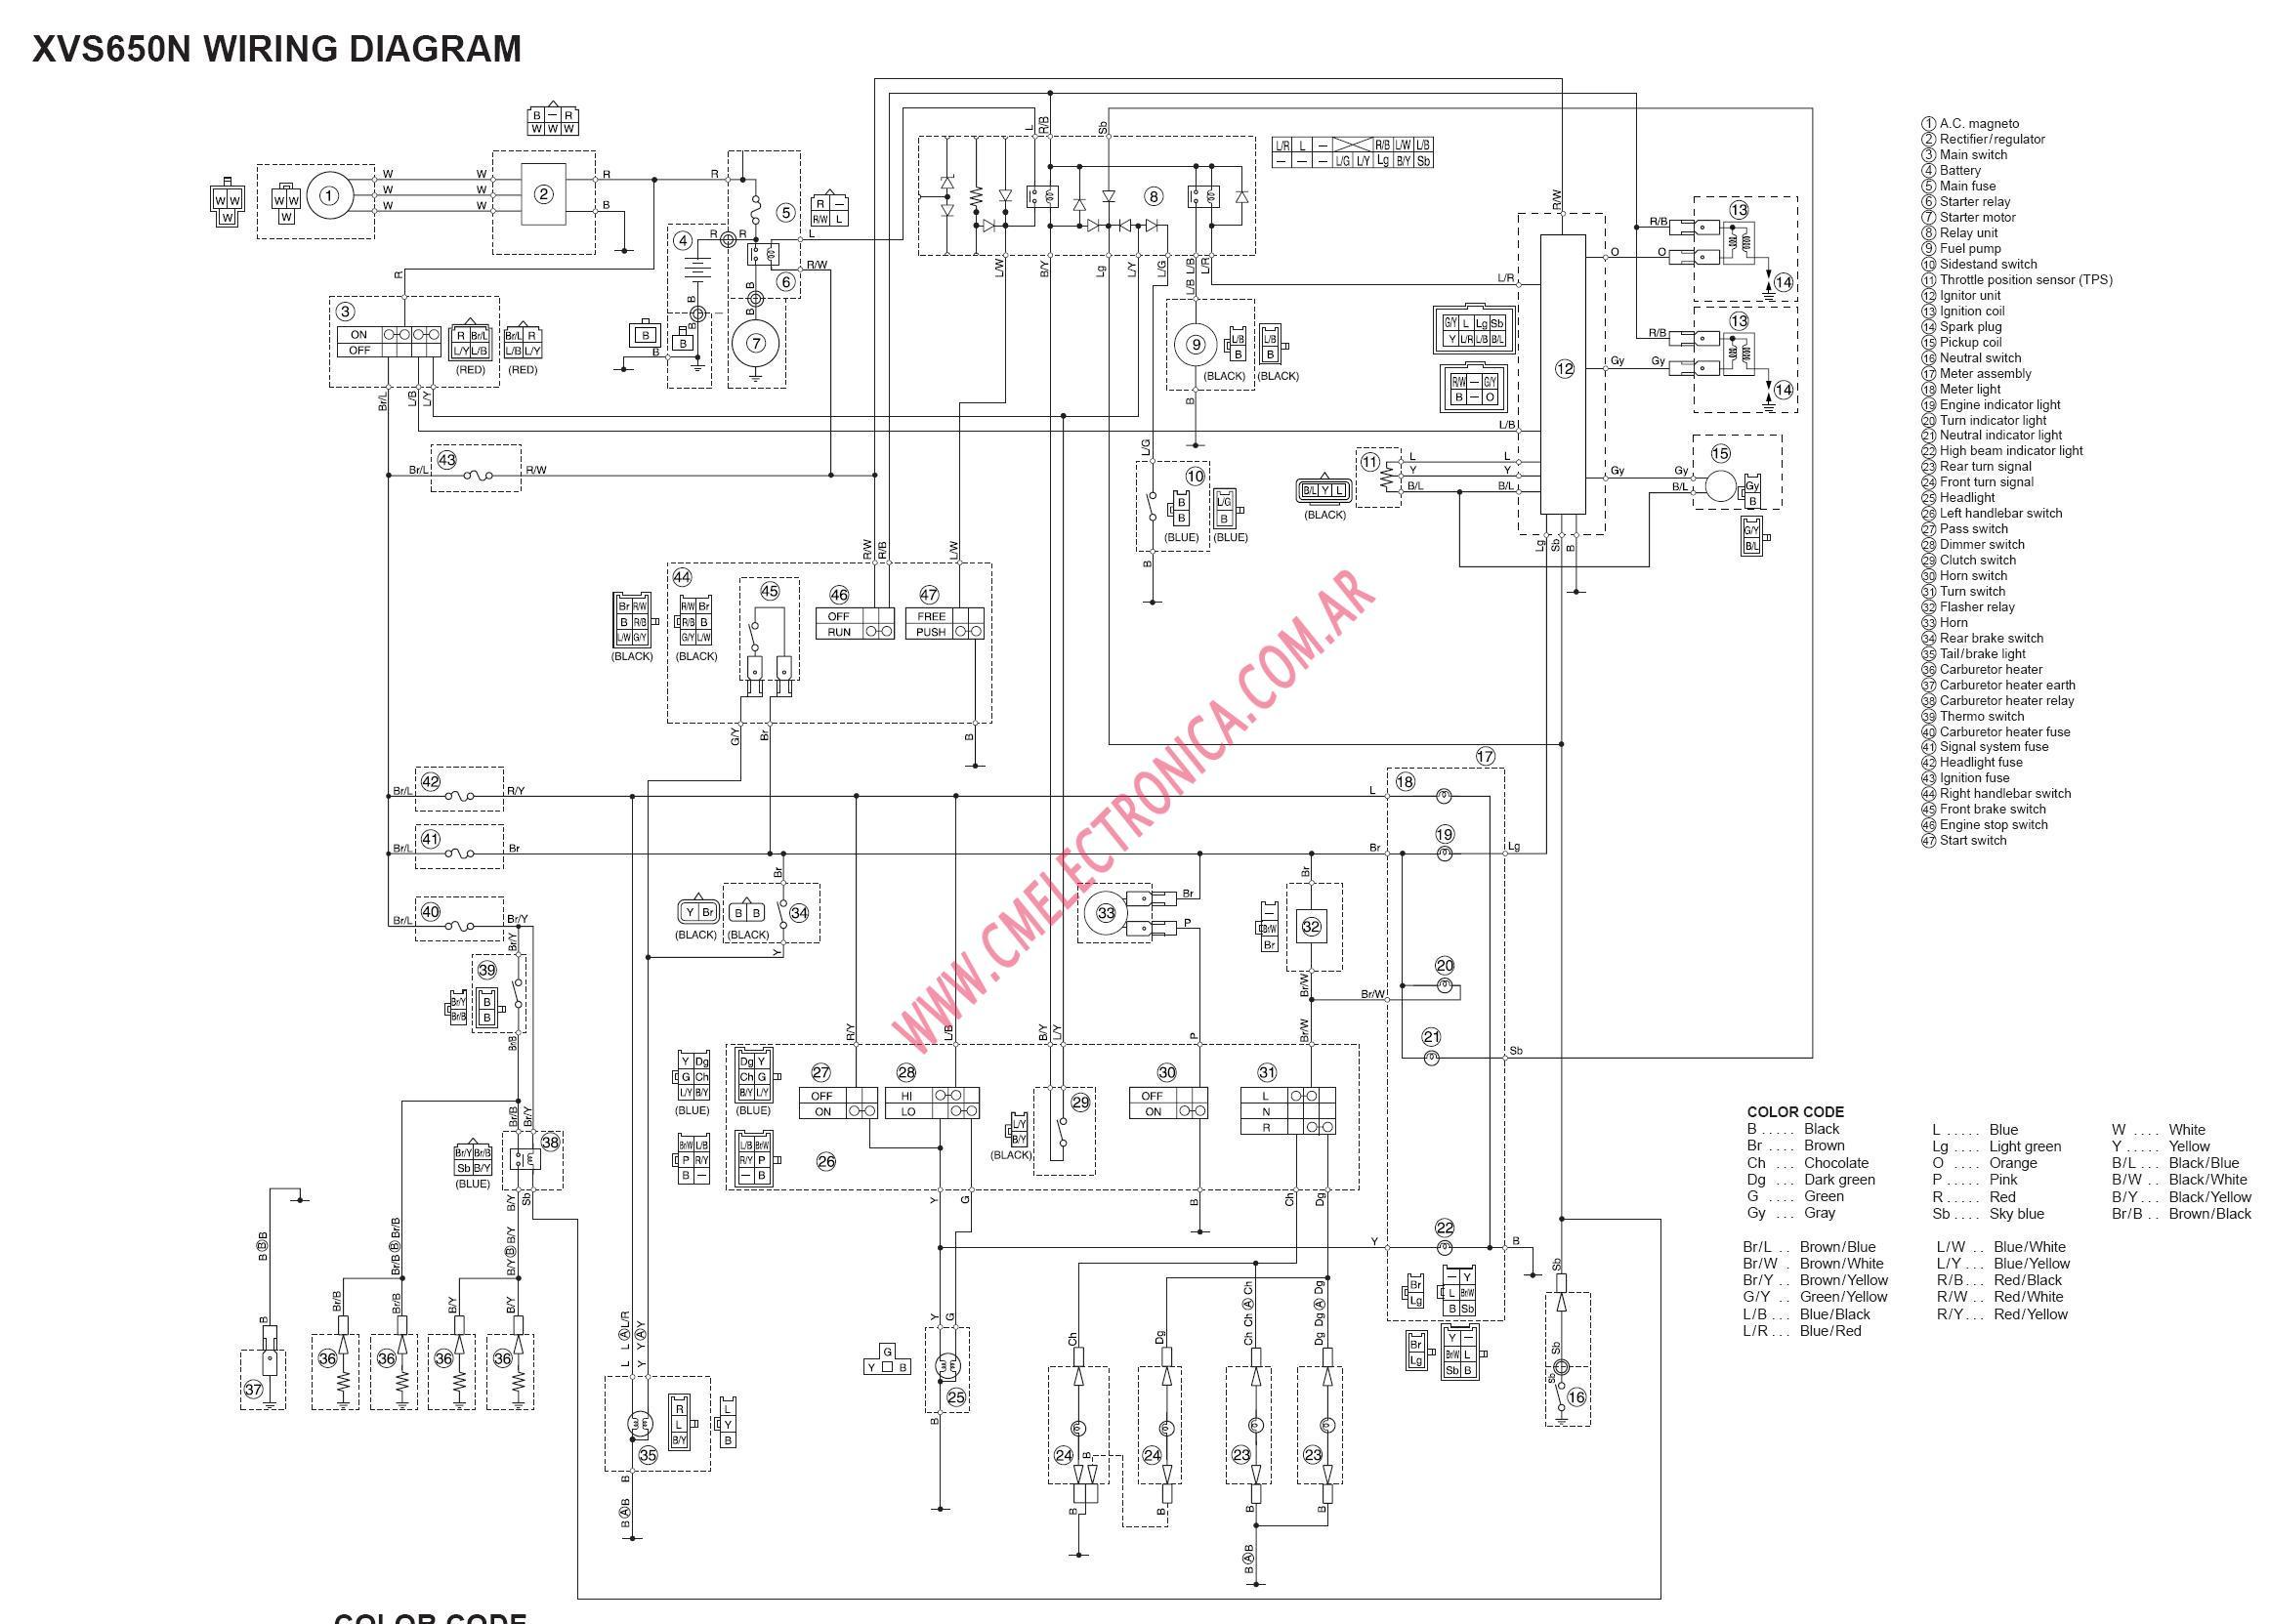 Wiring Diagram Yamaha V Star 1100 - Online Wiring Diagram on blue star drawings, blue bird wiring diagrams, blue star service,